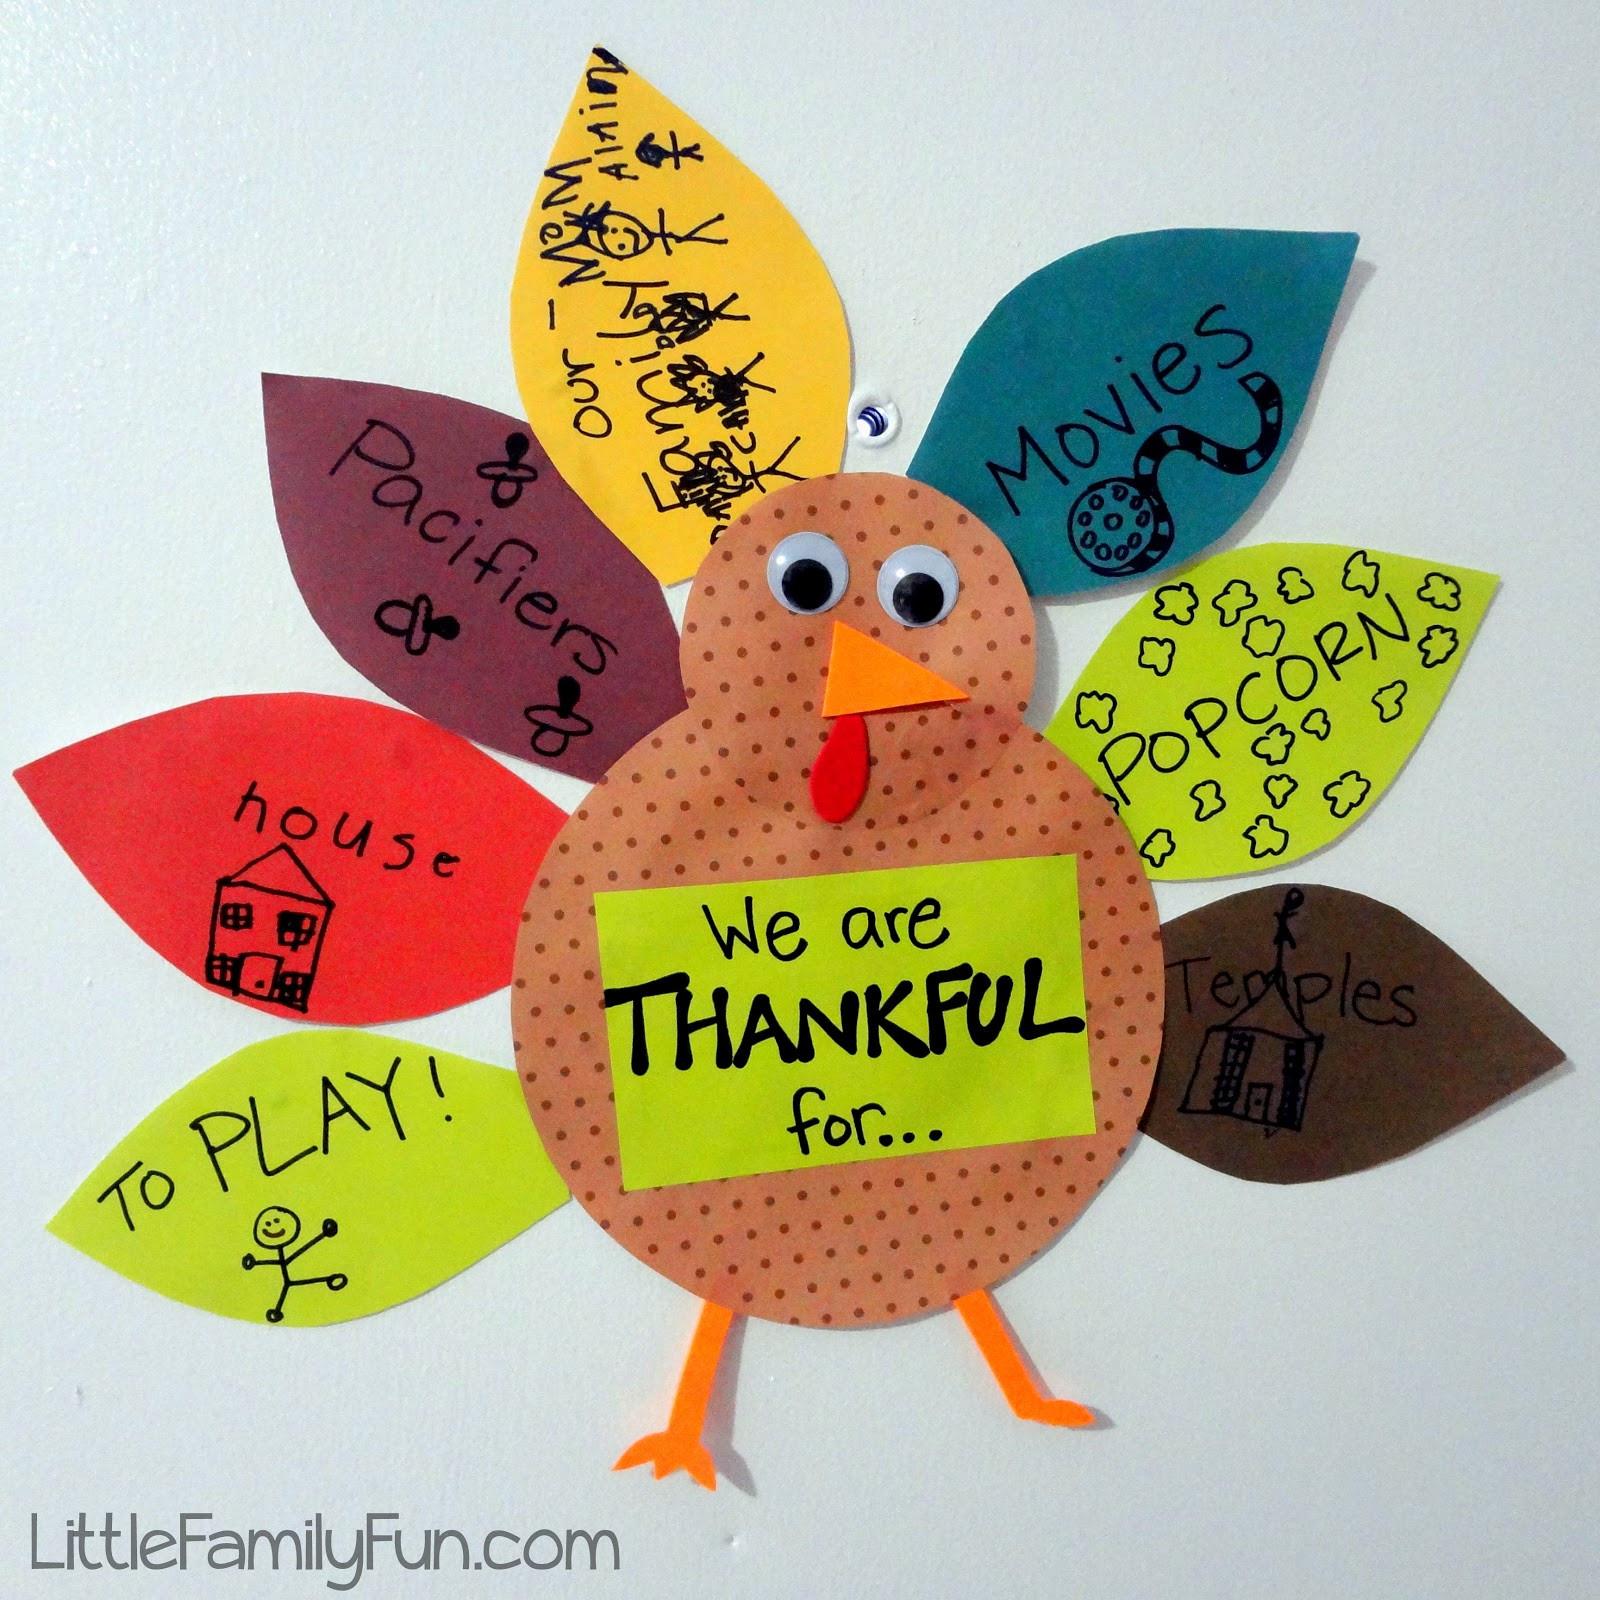 Turkey Crafts For Thanksgiving  Little Family Fun Gratitude Turkey 2012 Thanksgiving